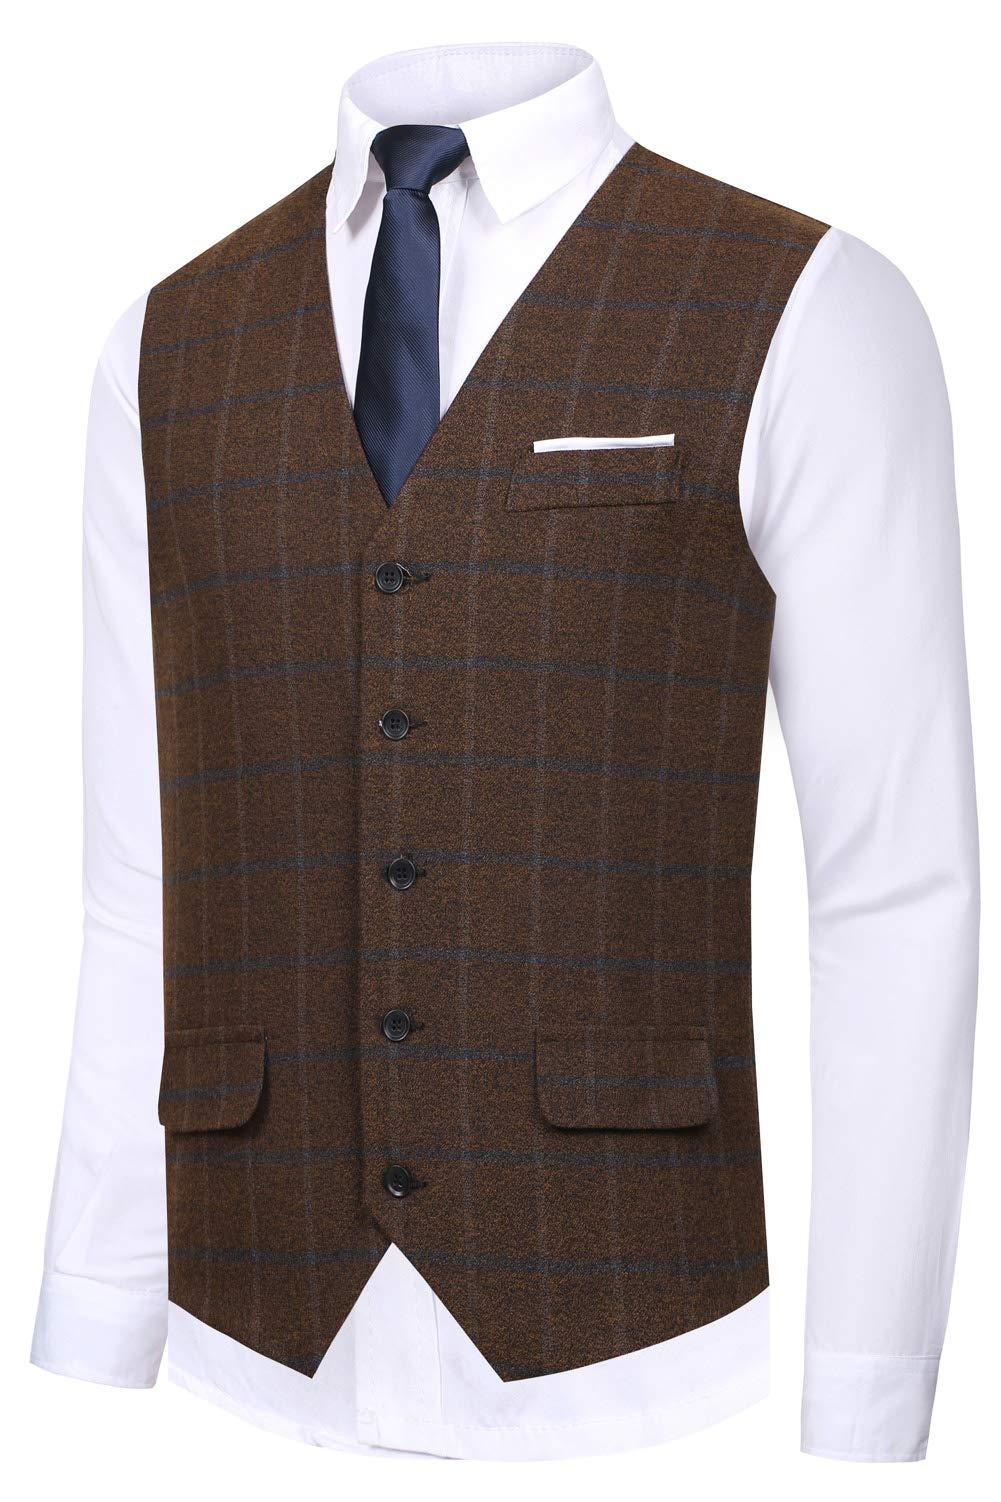 Hanayome Men's Gentleman Top Design Casual Waistcoat Business Suit Vest VS17,Brown,L(US Tag Chest 44'' Waist 38'') by Hanayome